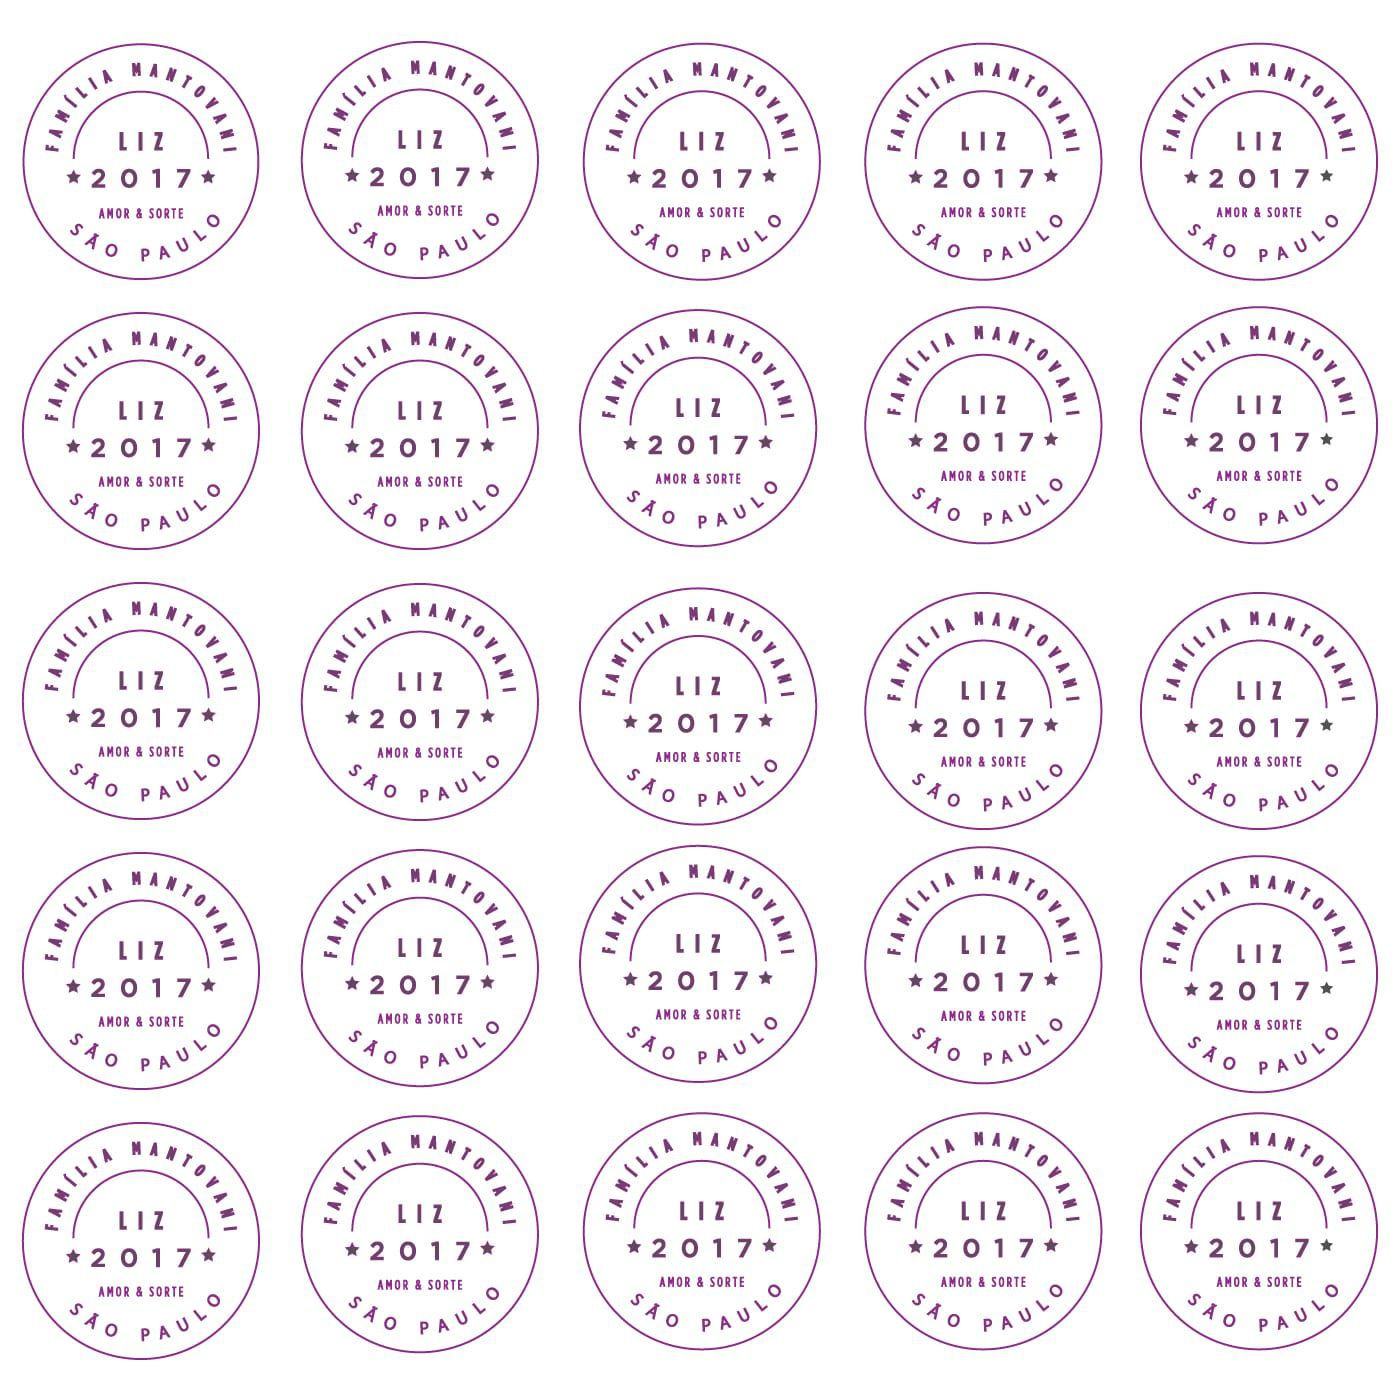 cobertor em pattern meu stamp - 14 opções de cores